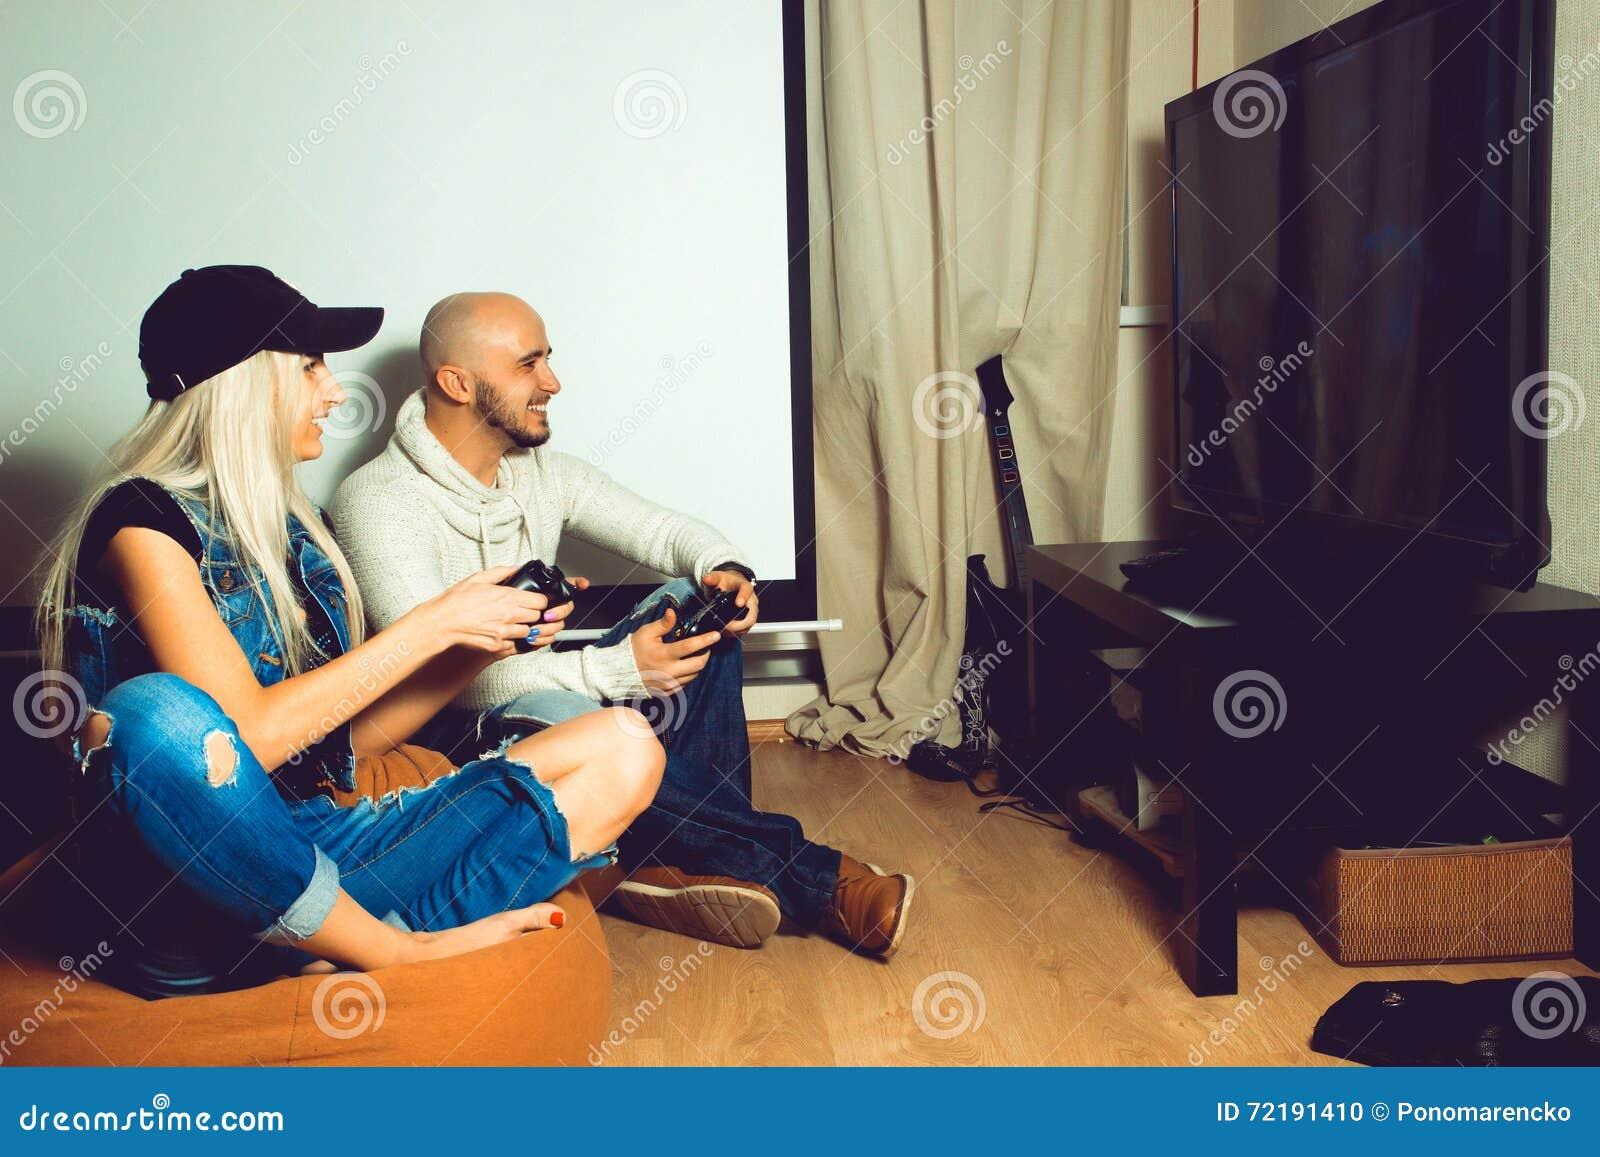 leisure entertainment